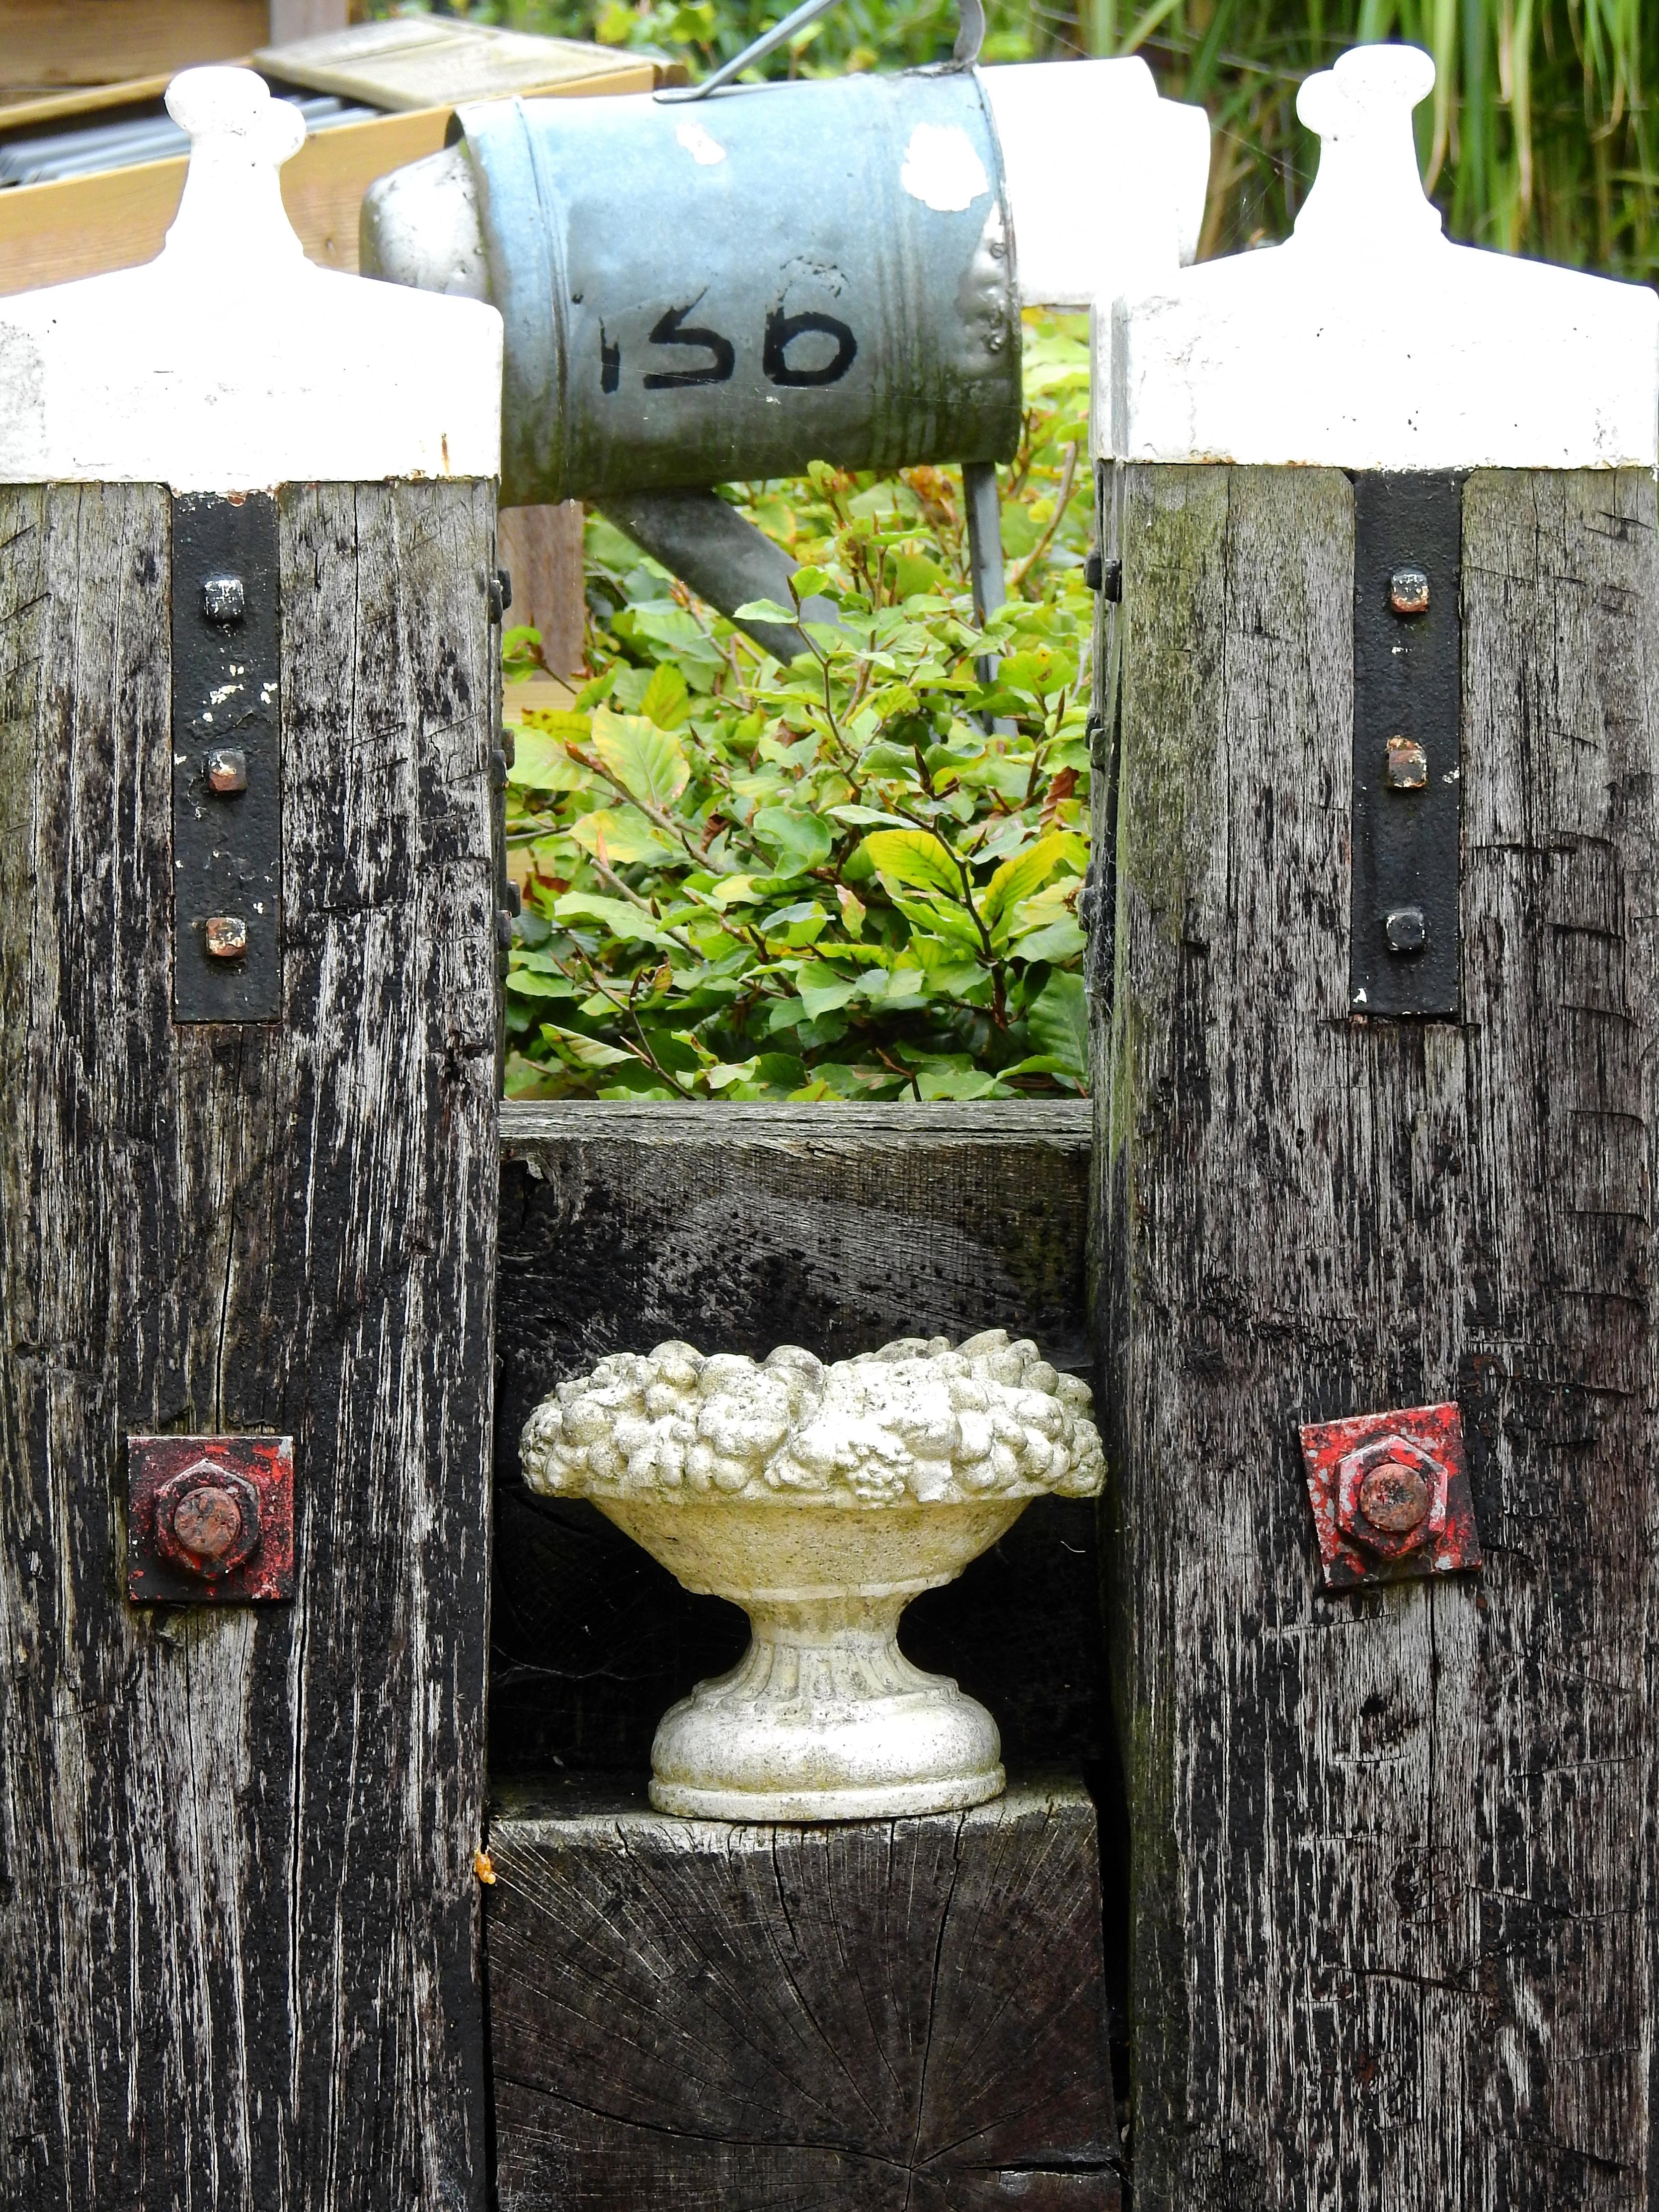 Fotos Gratis Cerca Enviar Madera Bar Decoraci N Mueble  # Muebles Num Decoracion